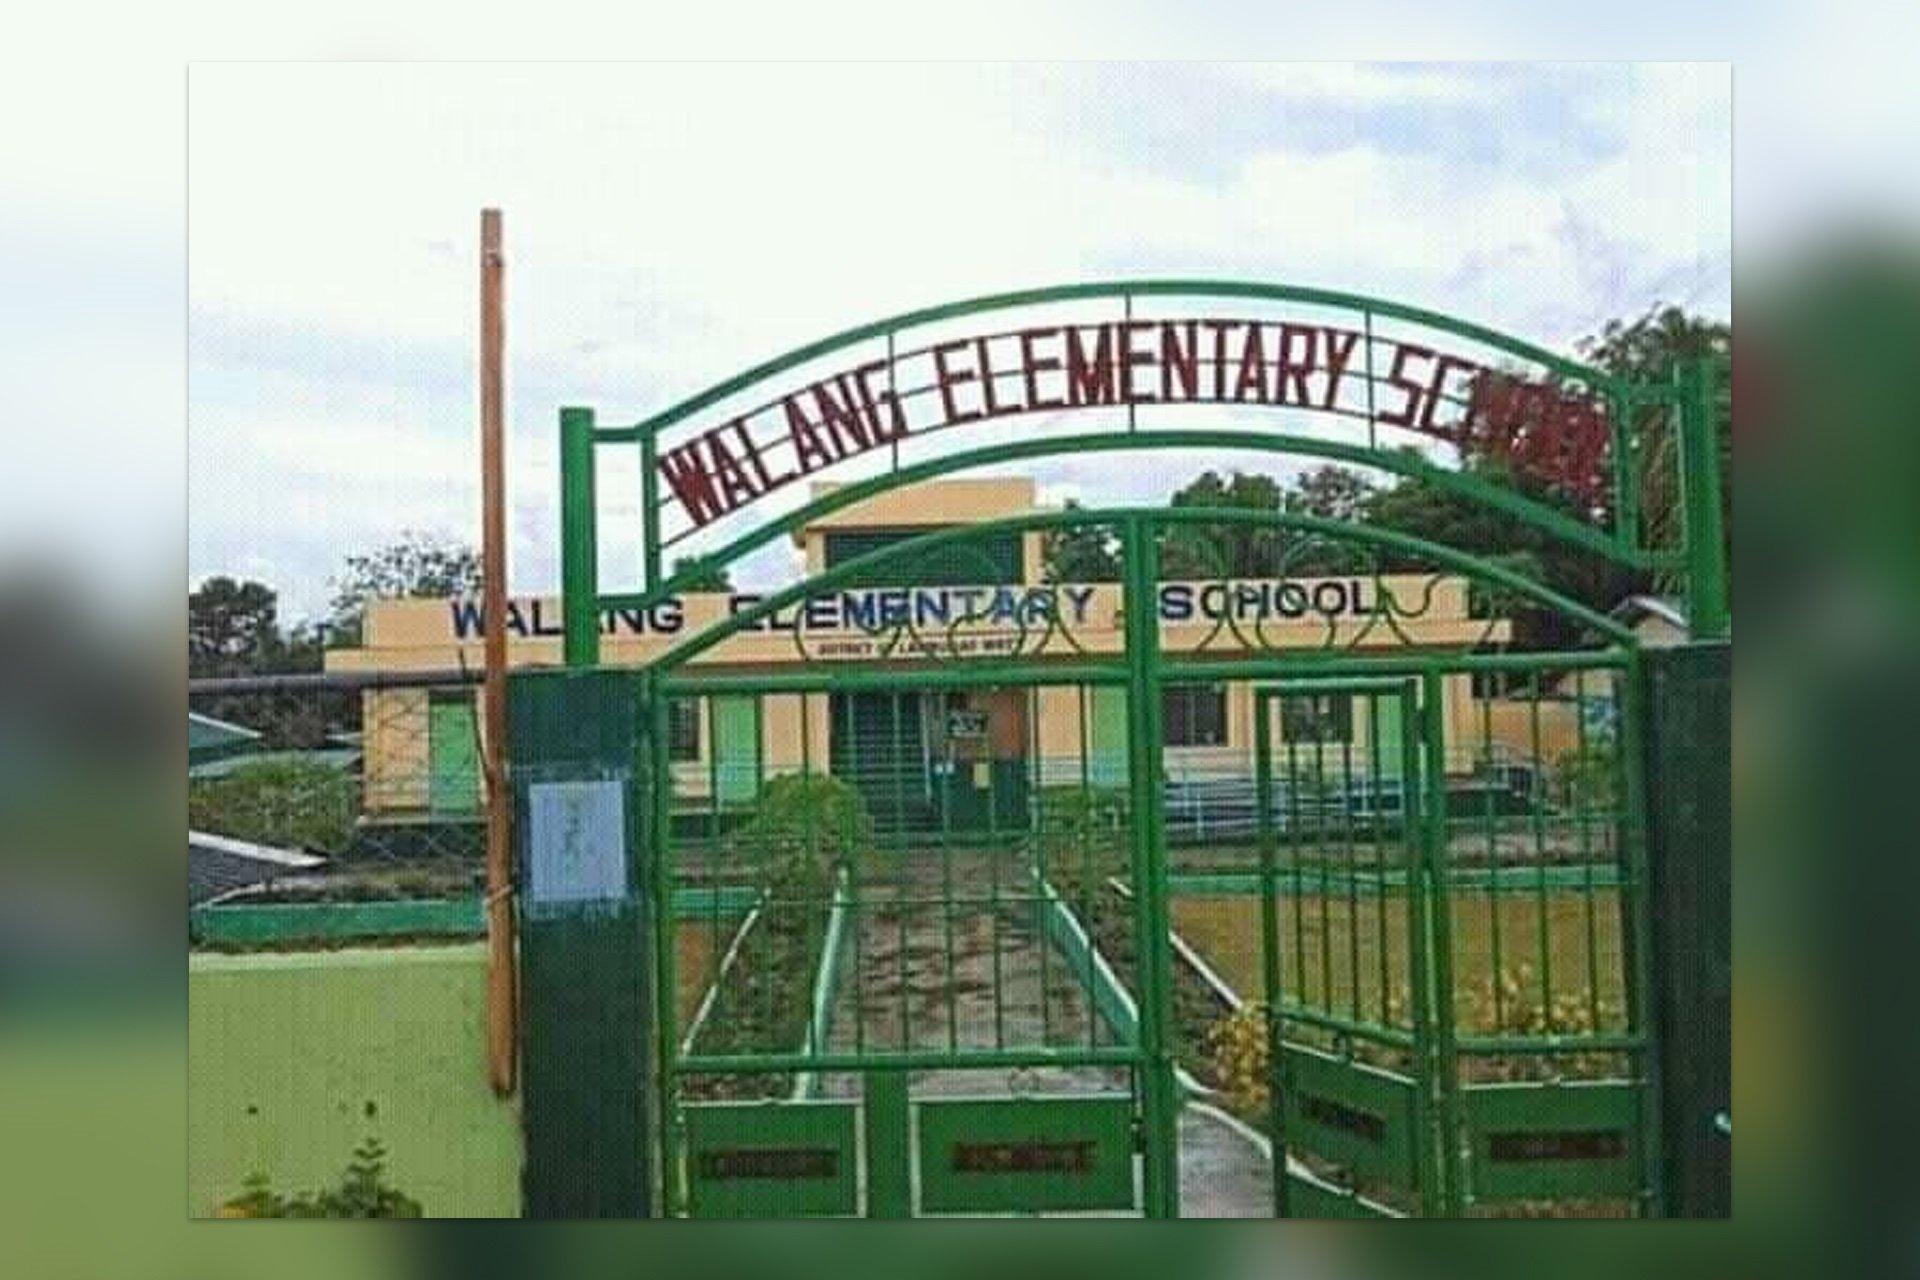 Walang Elementary School